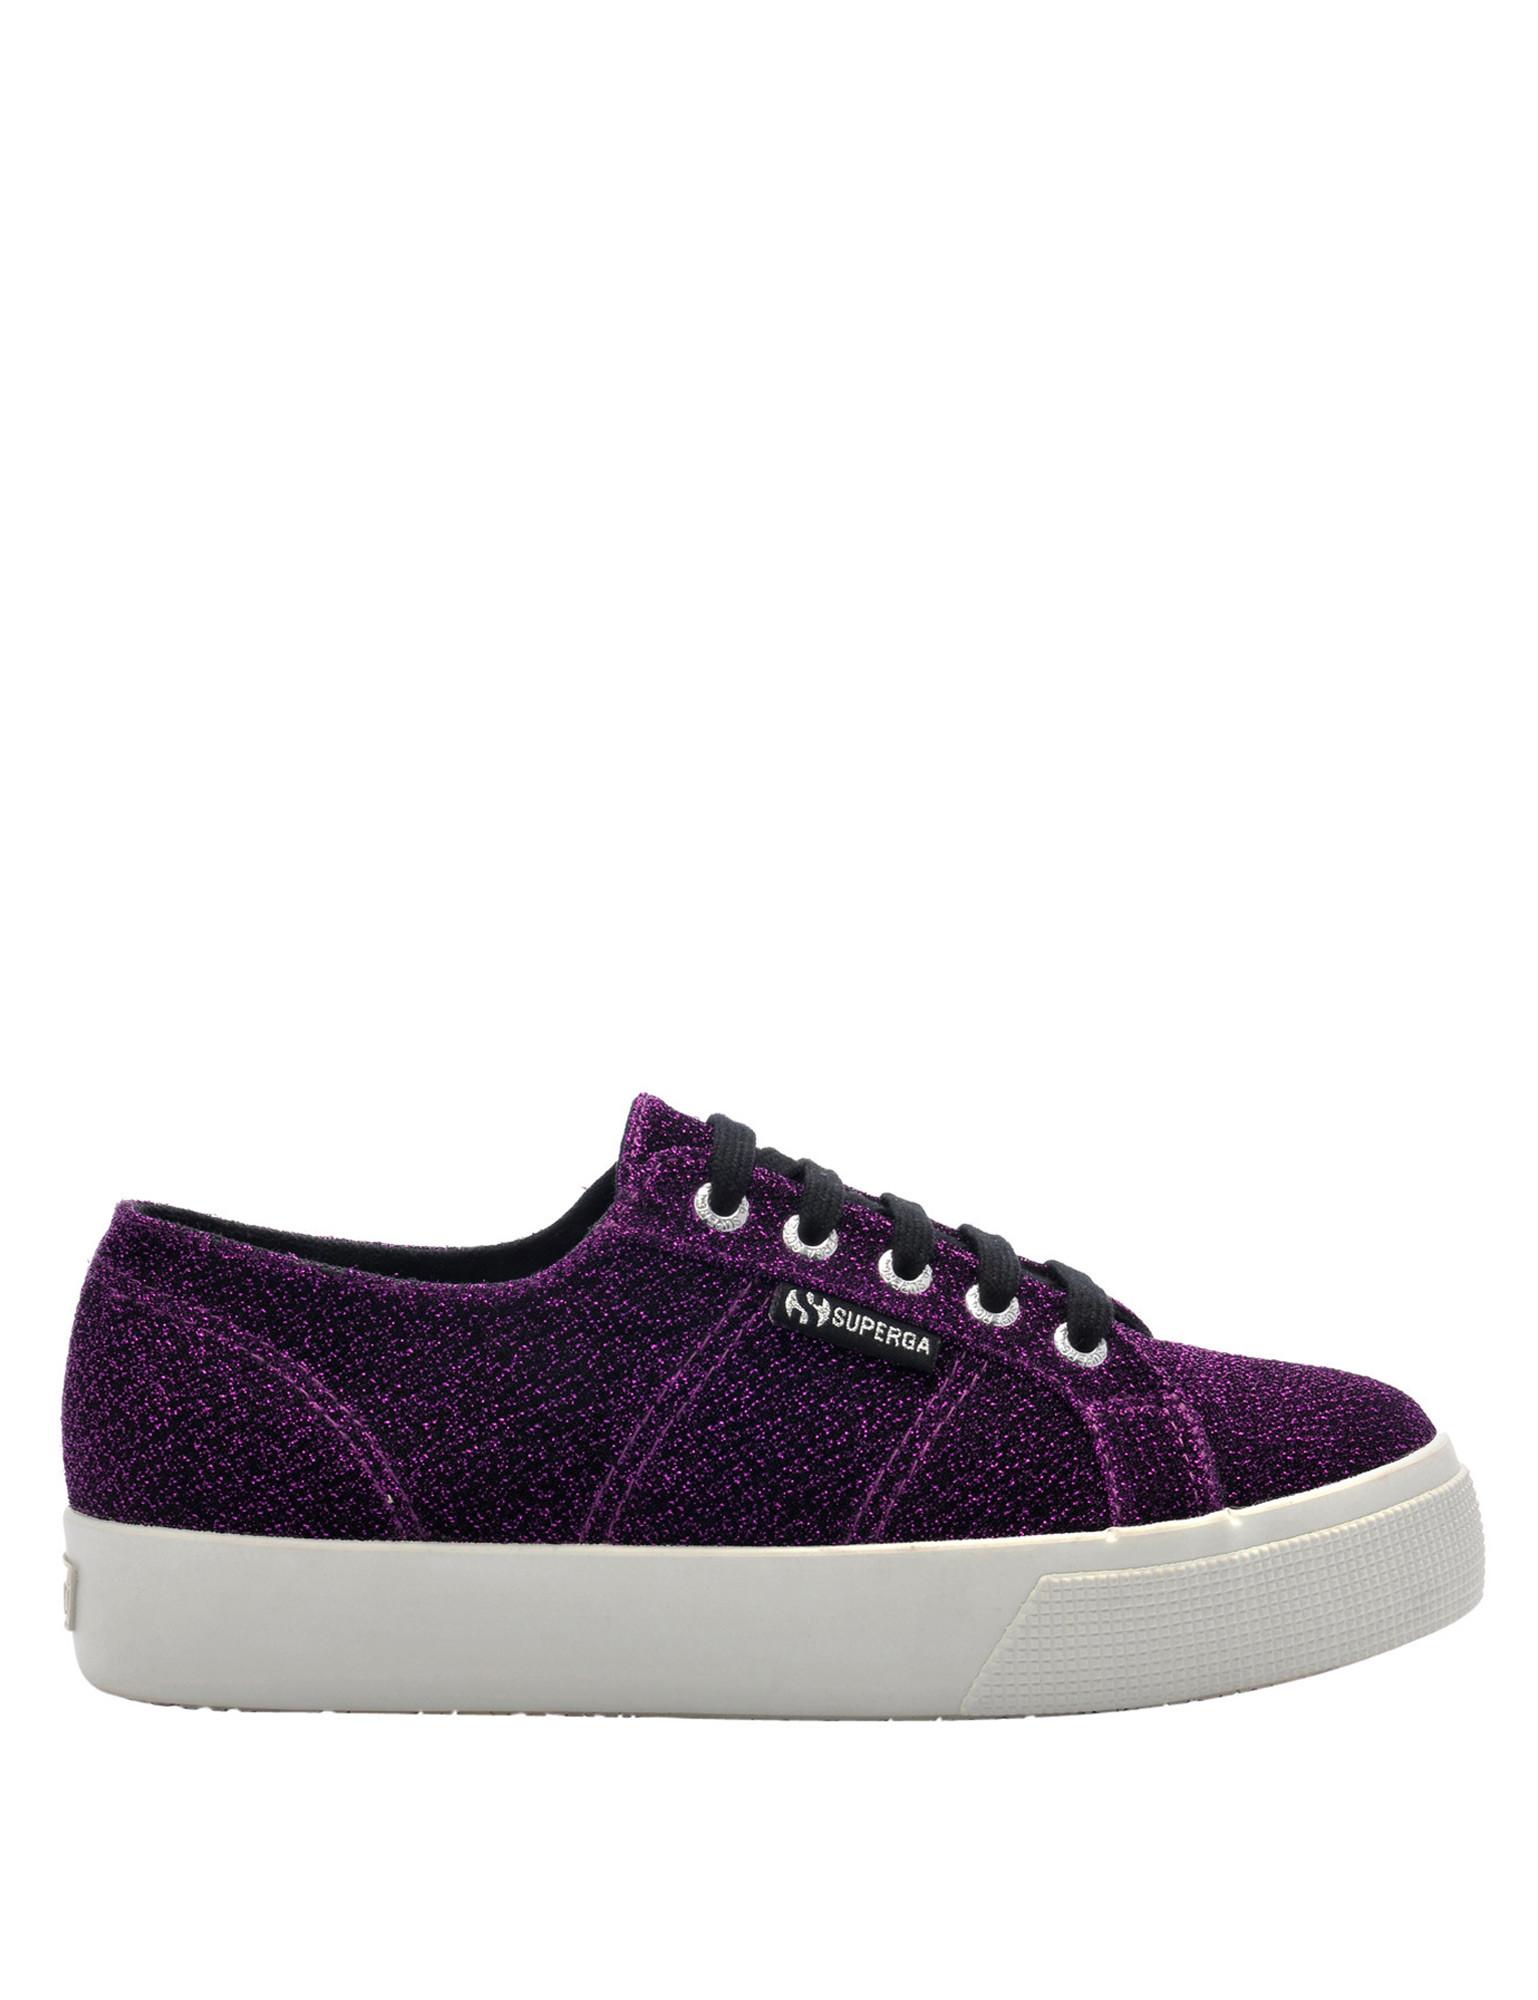 2730 Jerseyglitterw1 Violet